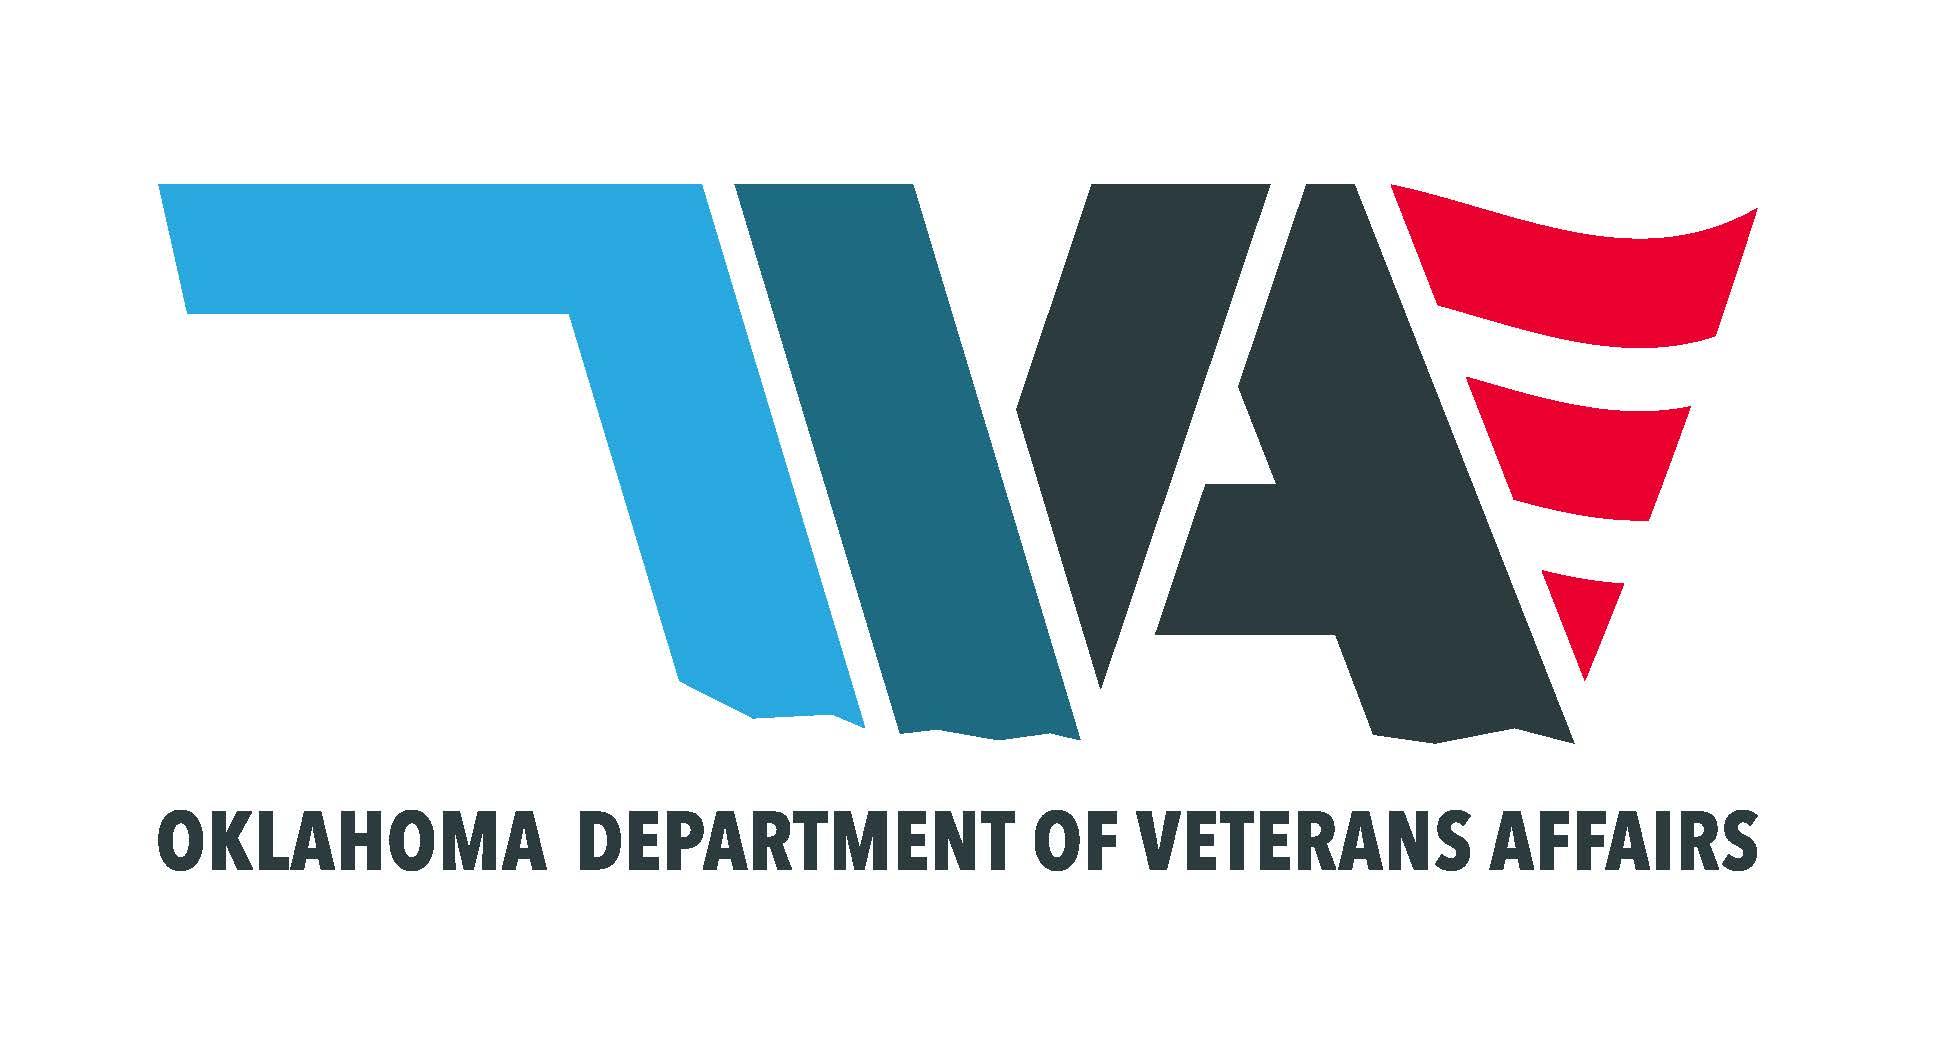 Oklahoma Department of Veterans Affairs Department of